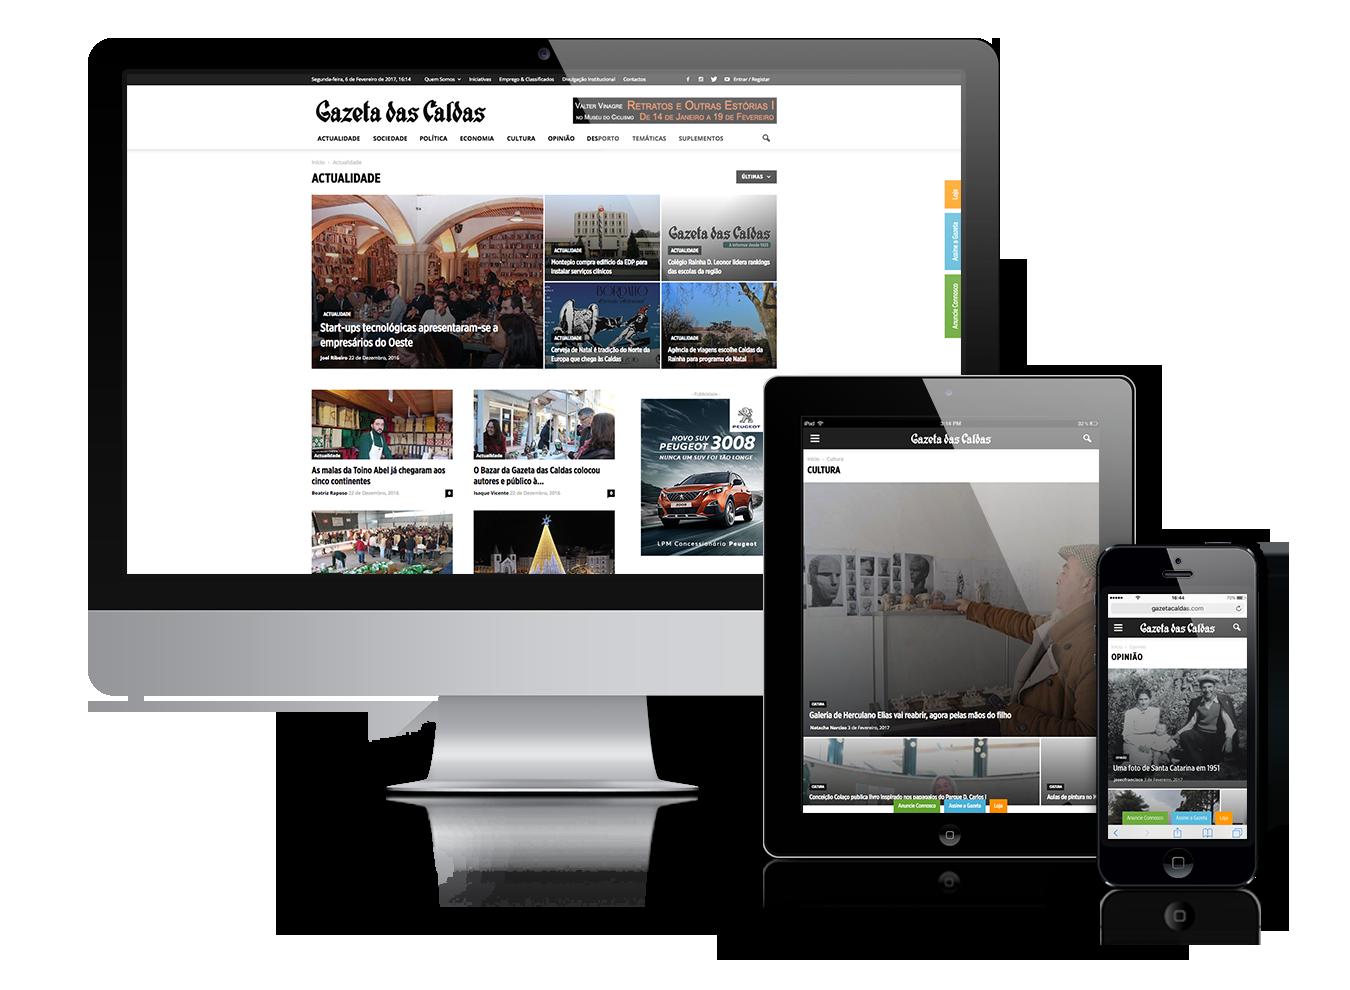 gazeta-caldas-design-responsivo-dispositivos